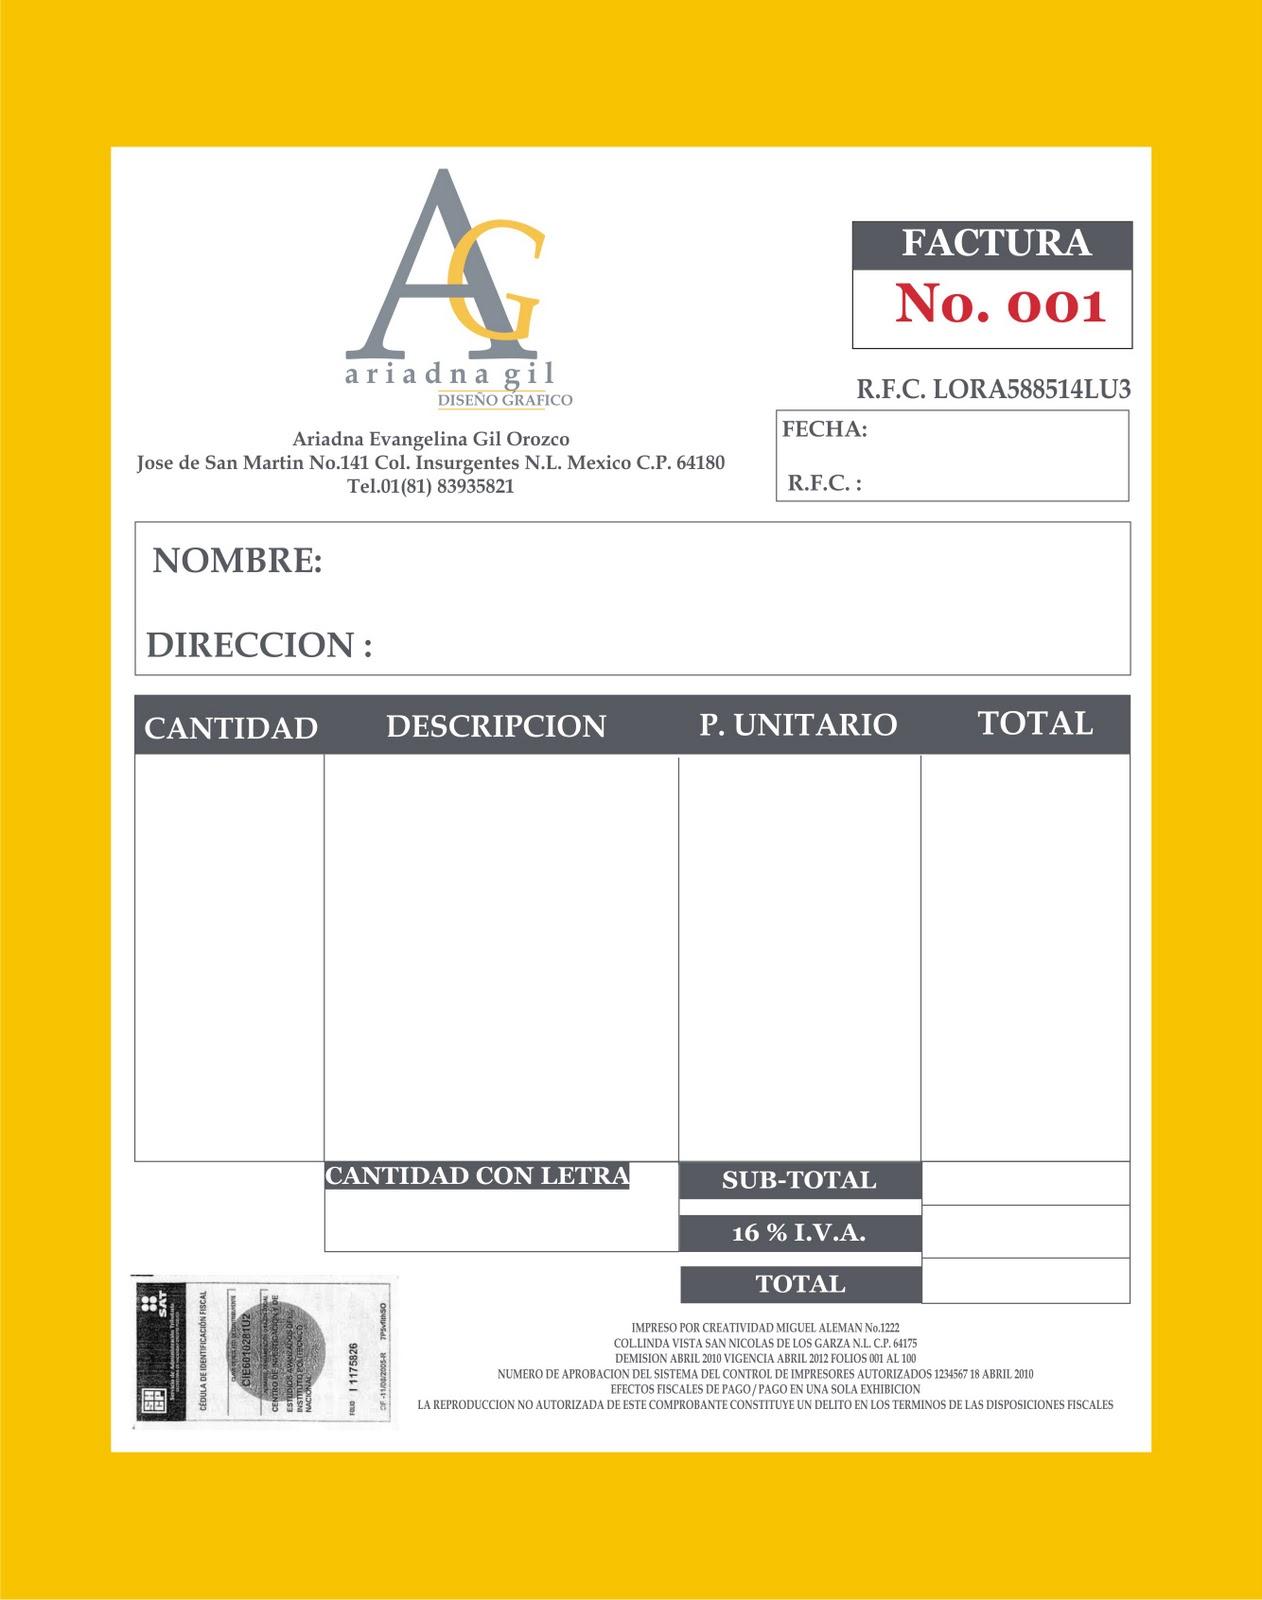 Graphic design identidad corporativa for Diseno de facturas